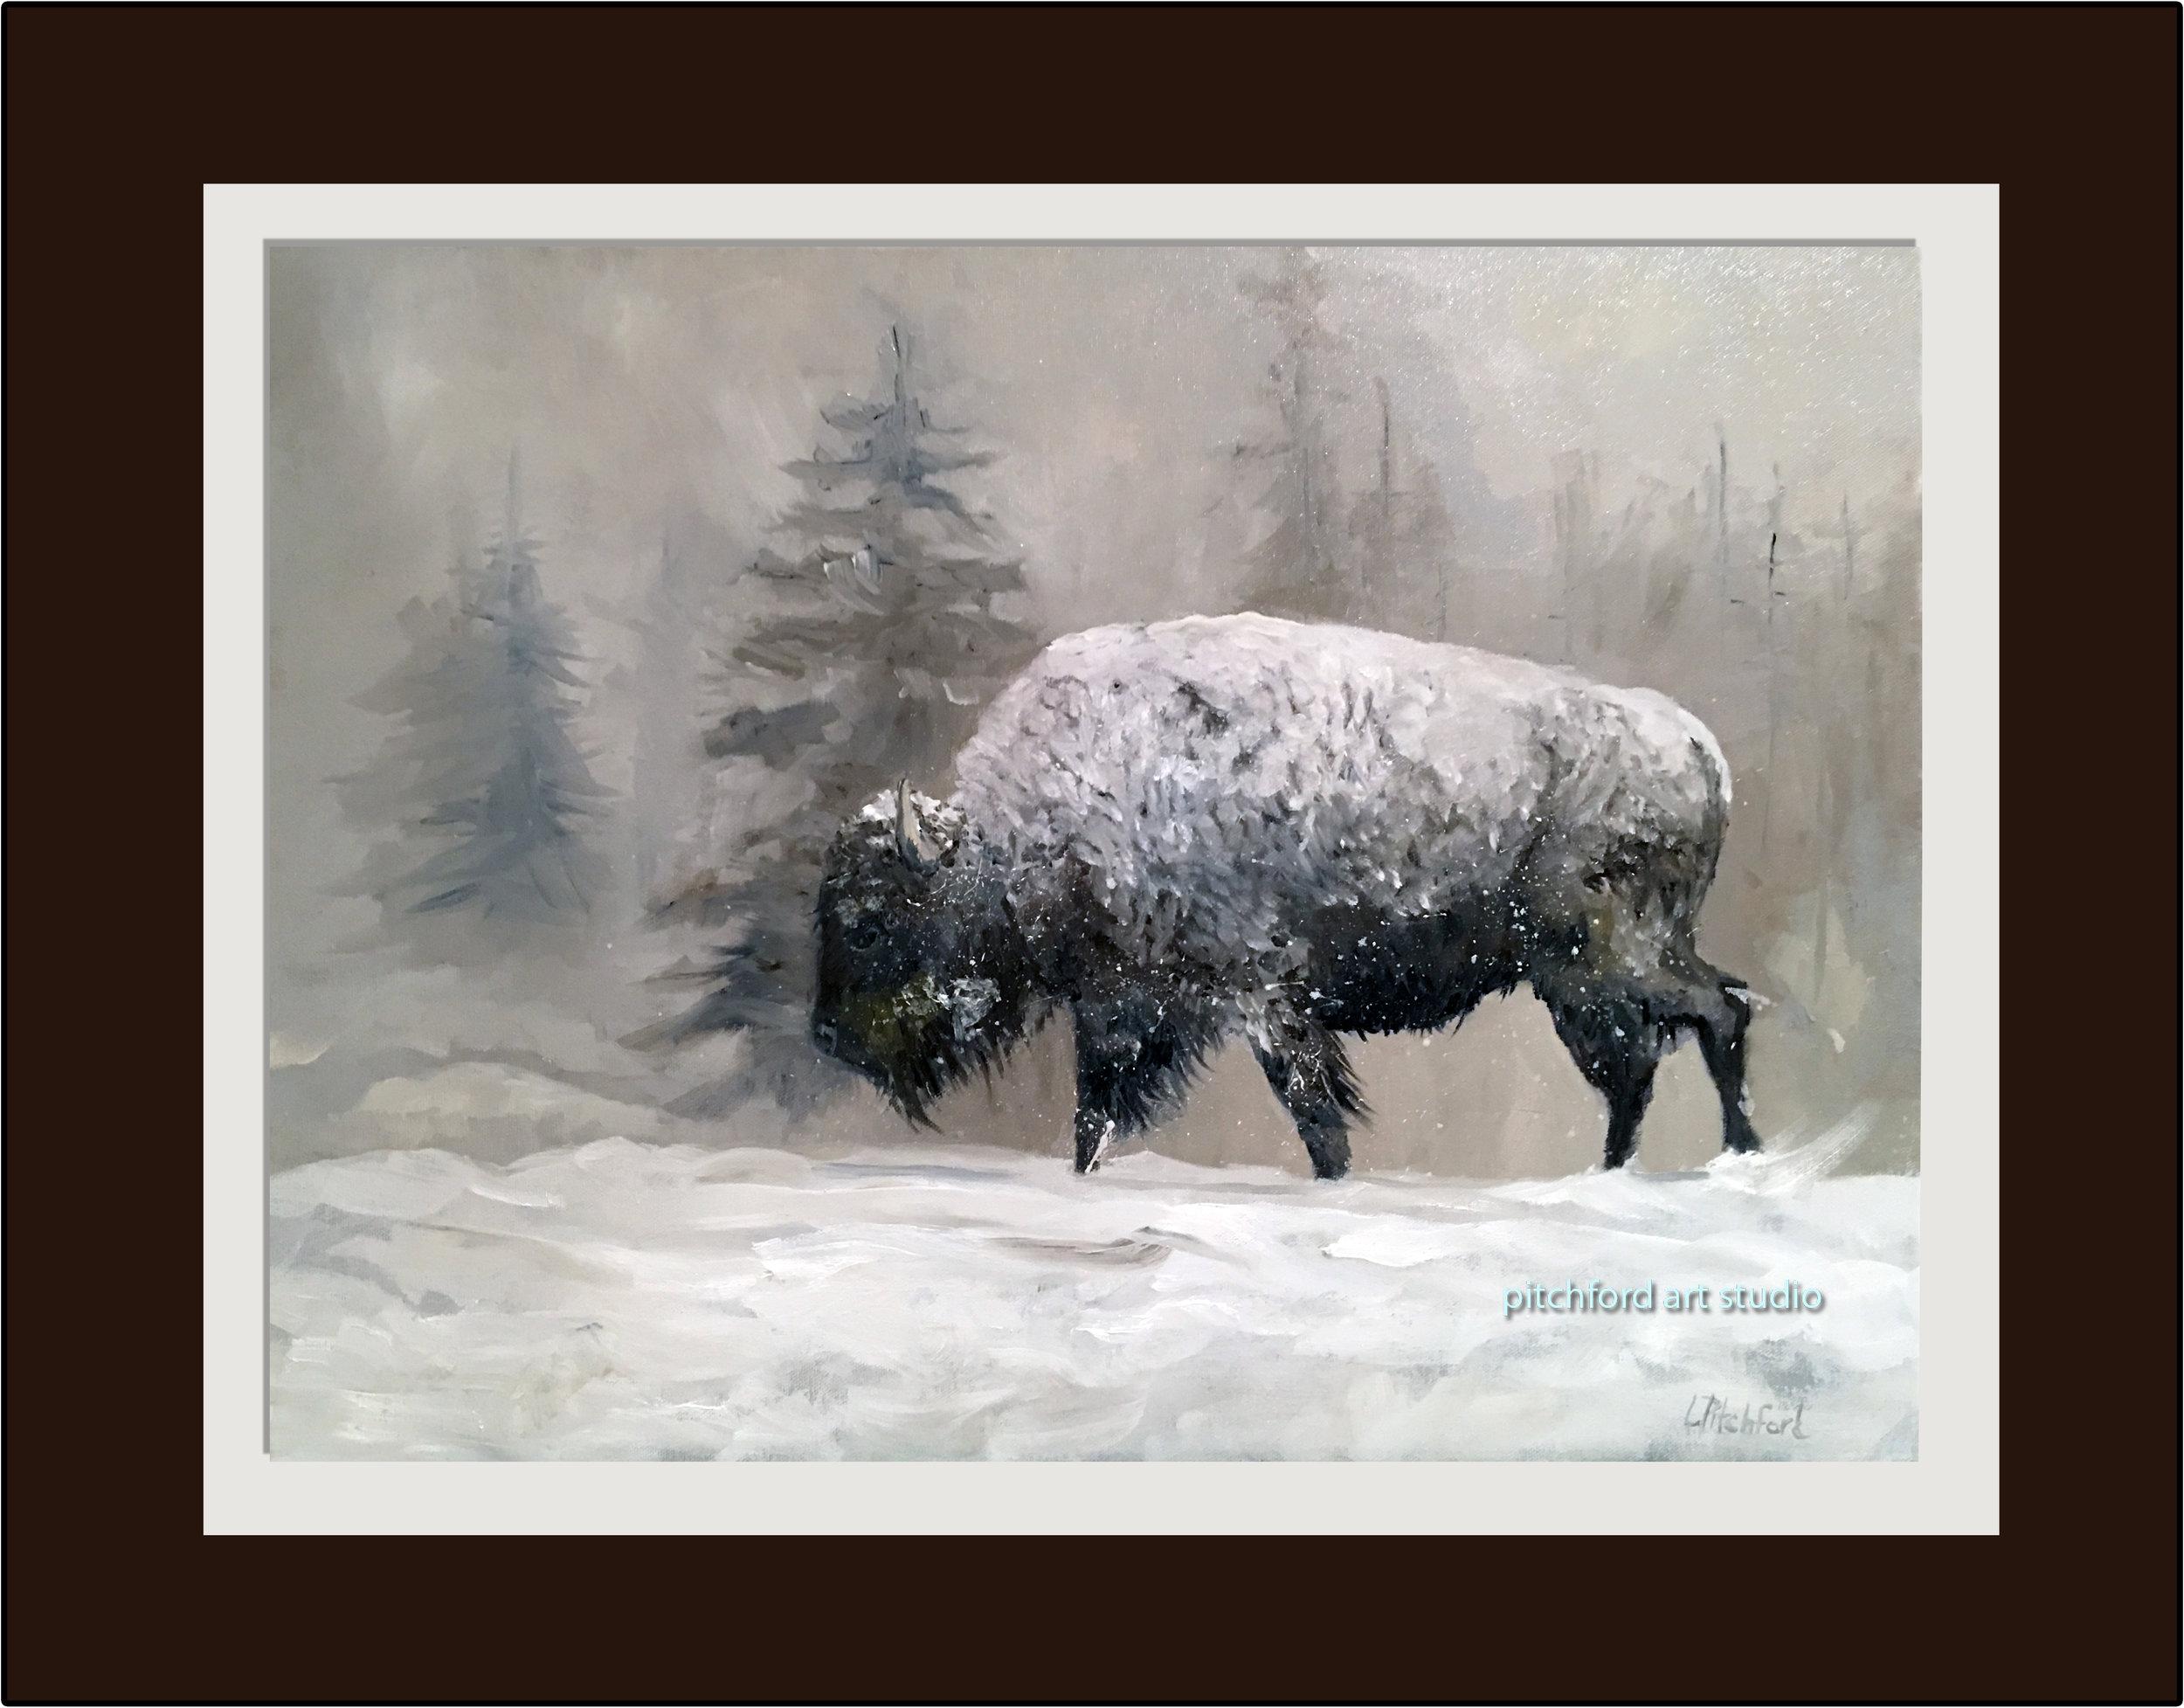 Winter Buffalo - Not Available